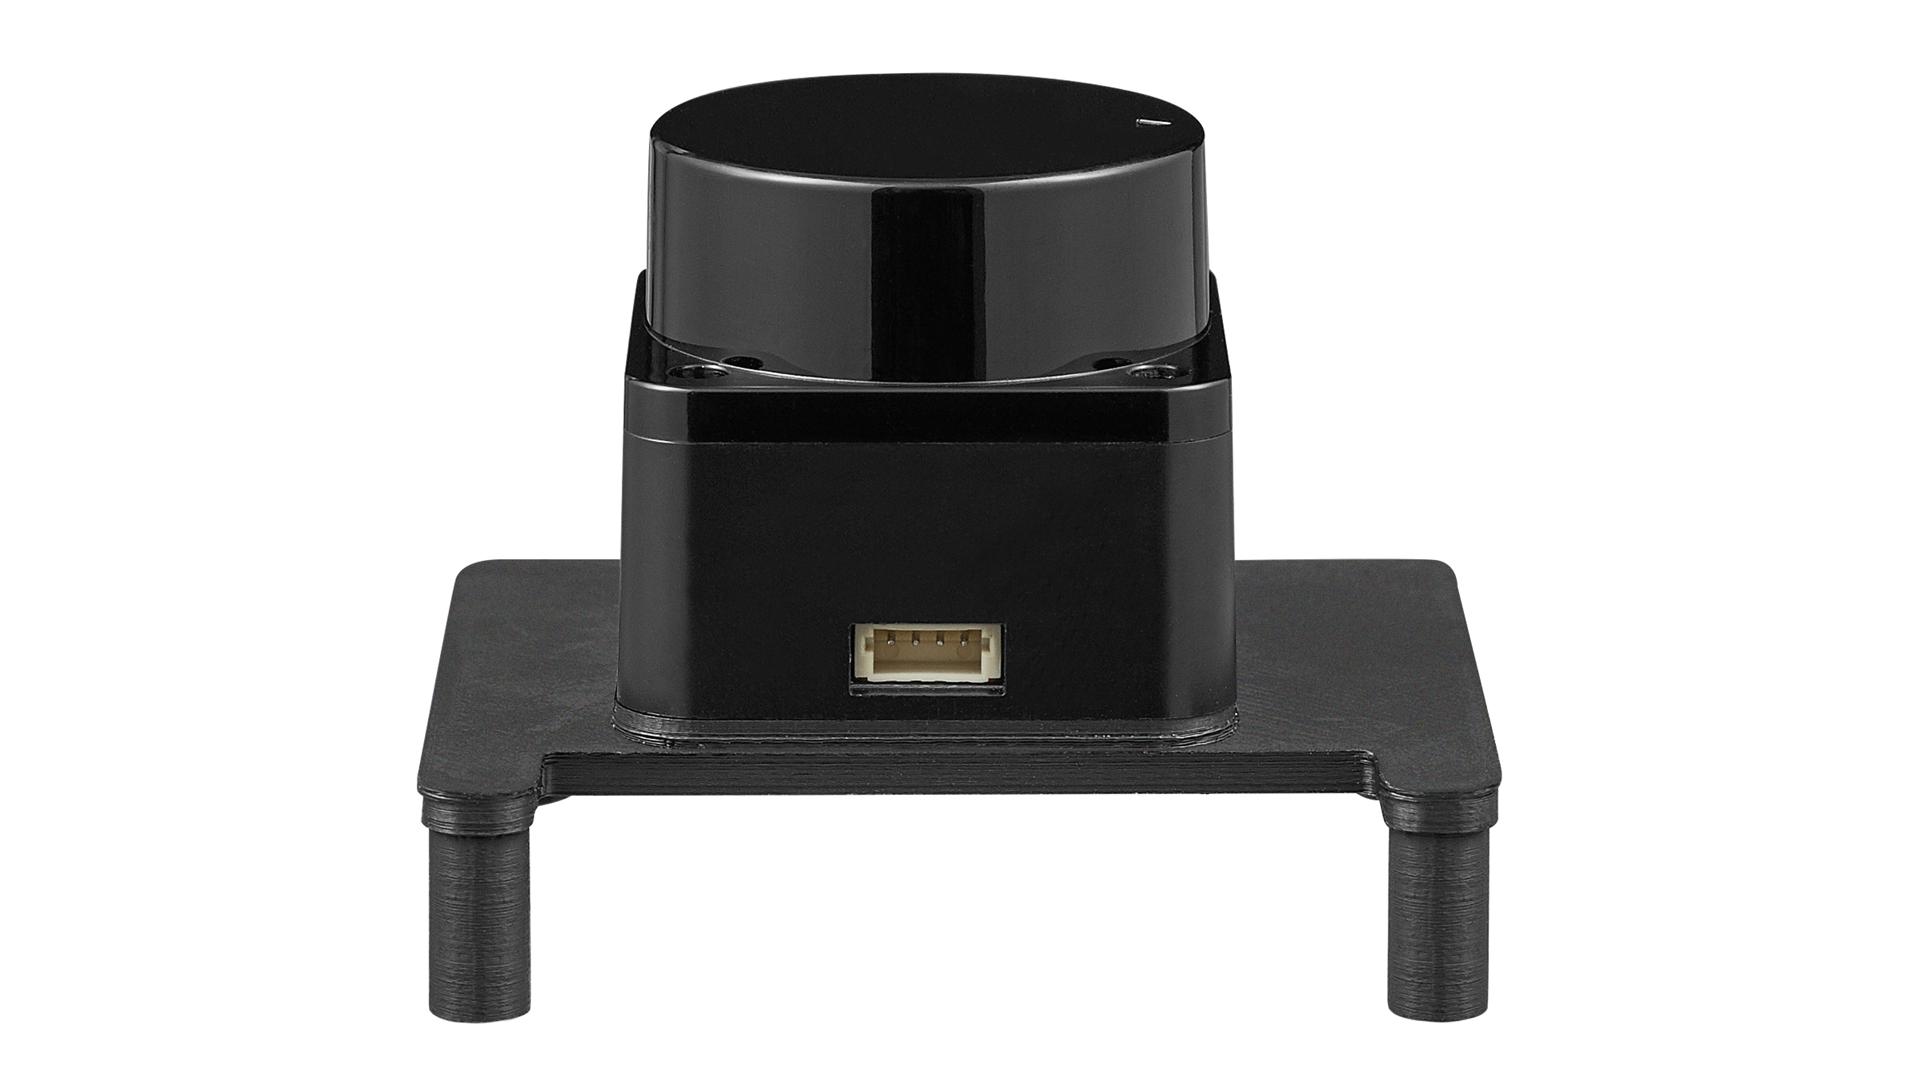 Lidar Module with Bracket